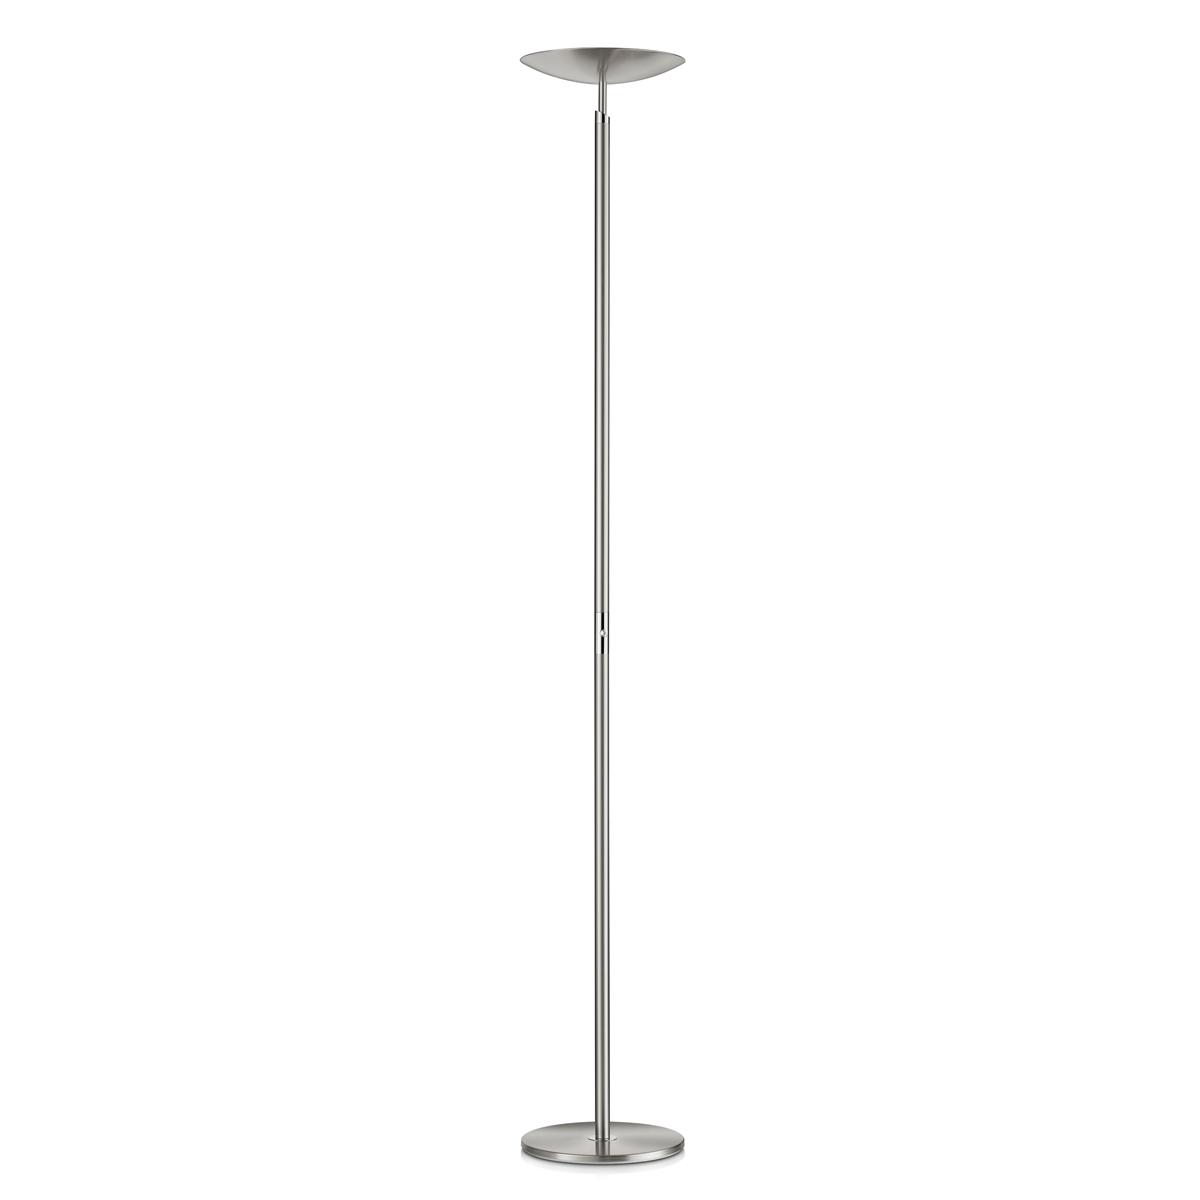 Knapstein Bela LED Deckenfluter 41.942.19